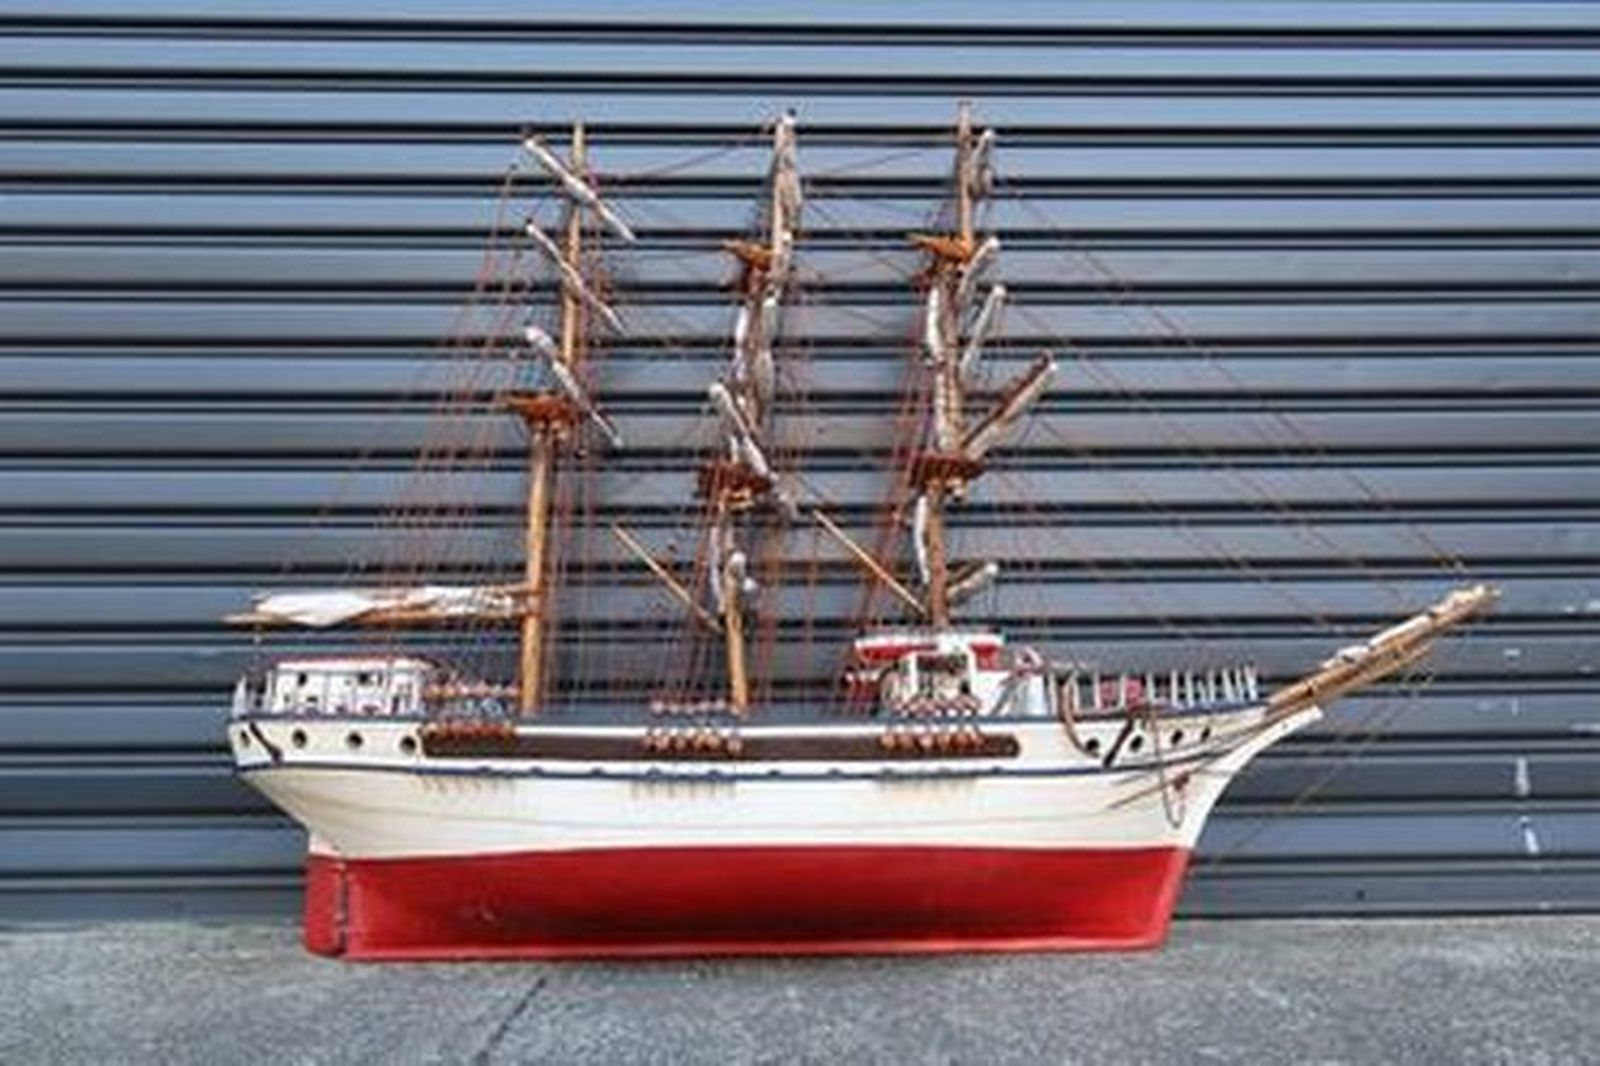 Model Ship - Scratch Built Timber 3 Mast Sailing Ship 'Gugliemo Marconi' (190 x 140 x 50cm)